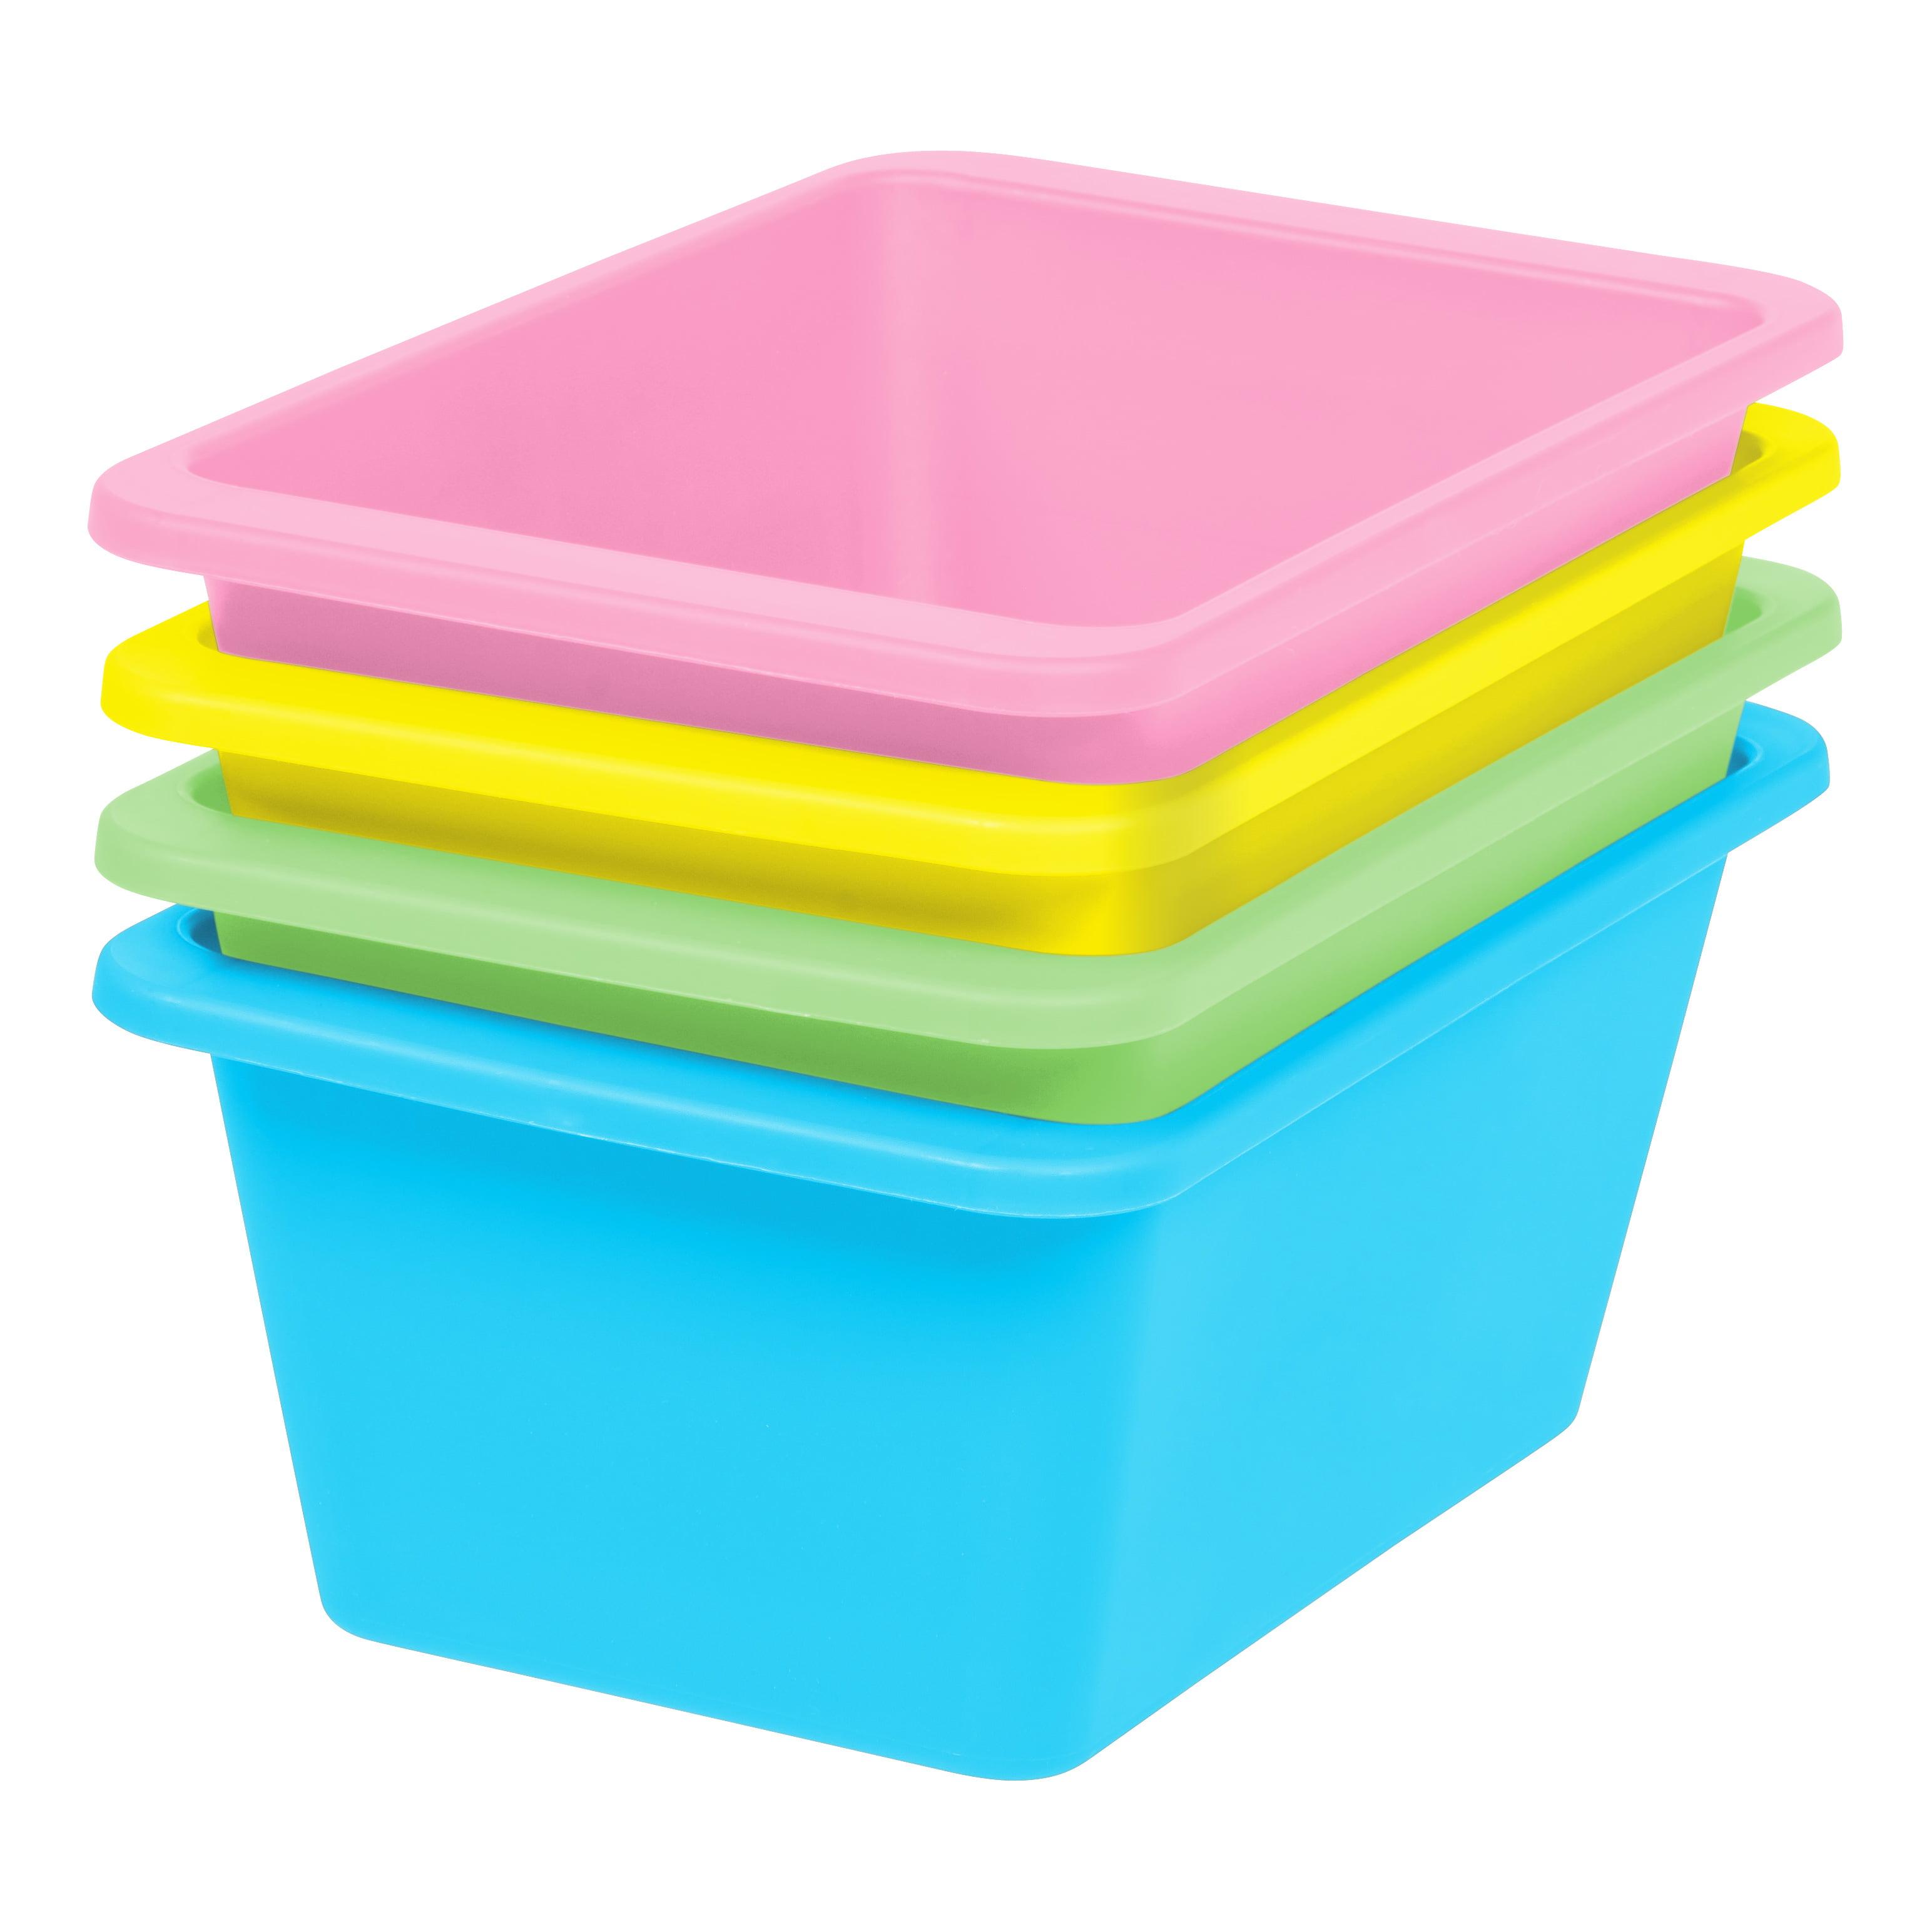 IRIS Small Multi-Purpose Plastic Bins, 4 Pack, Pastel